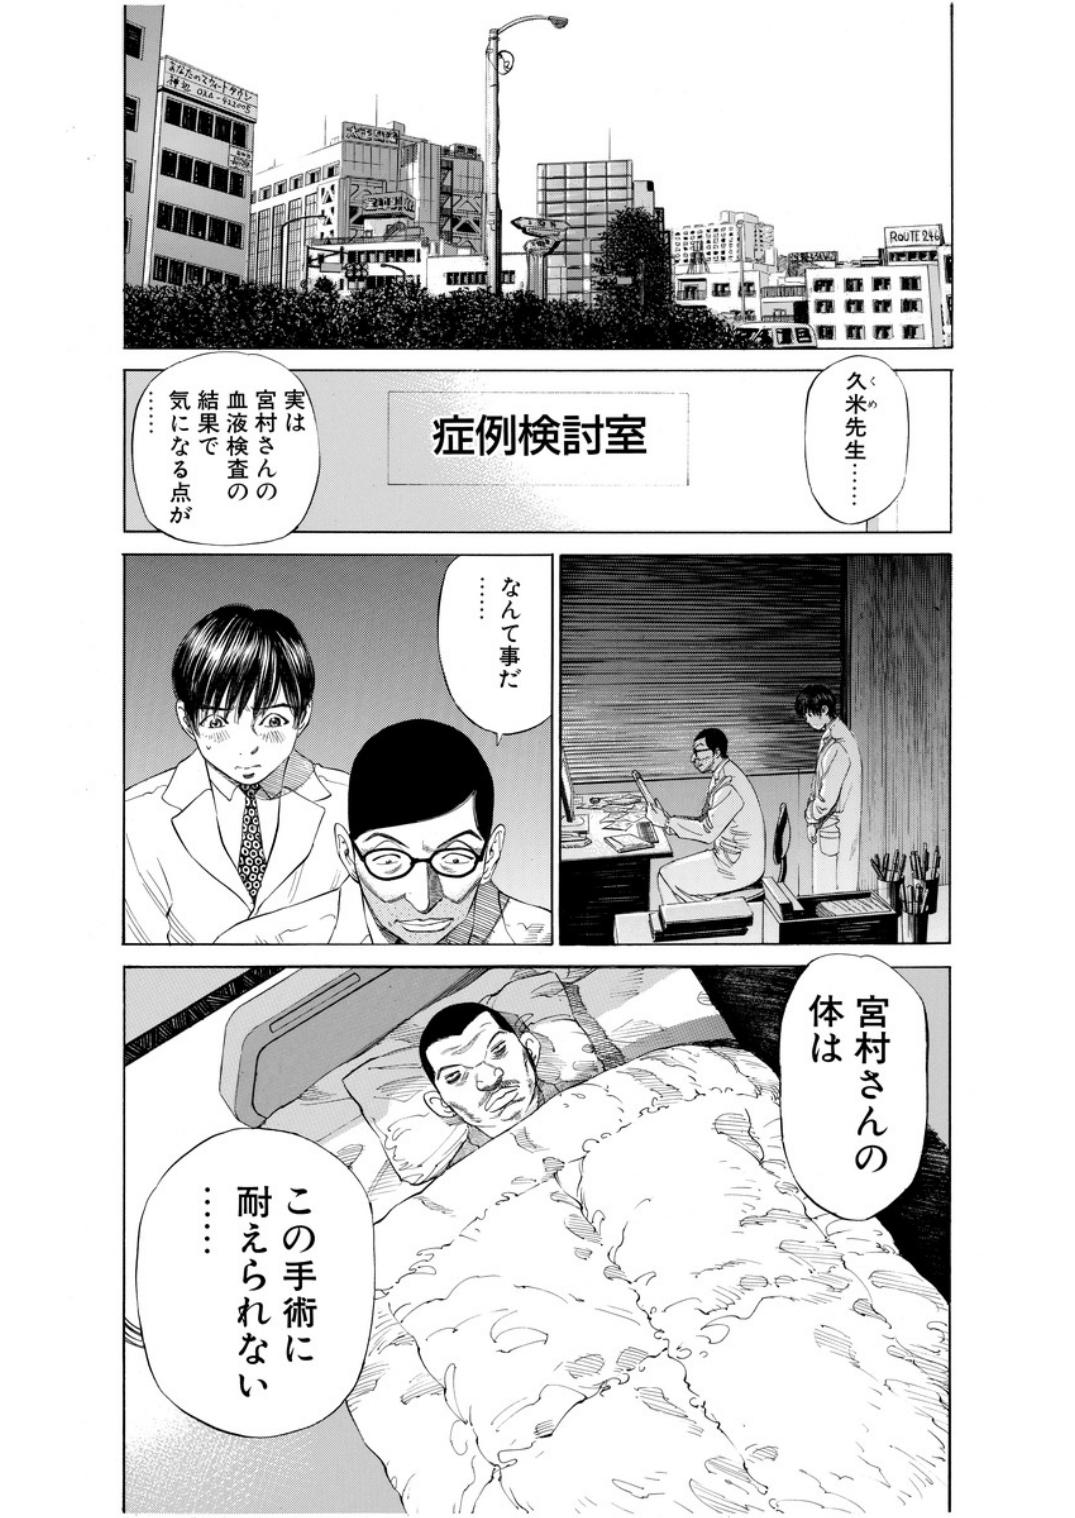 001bj_page-0208.jpg